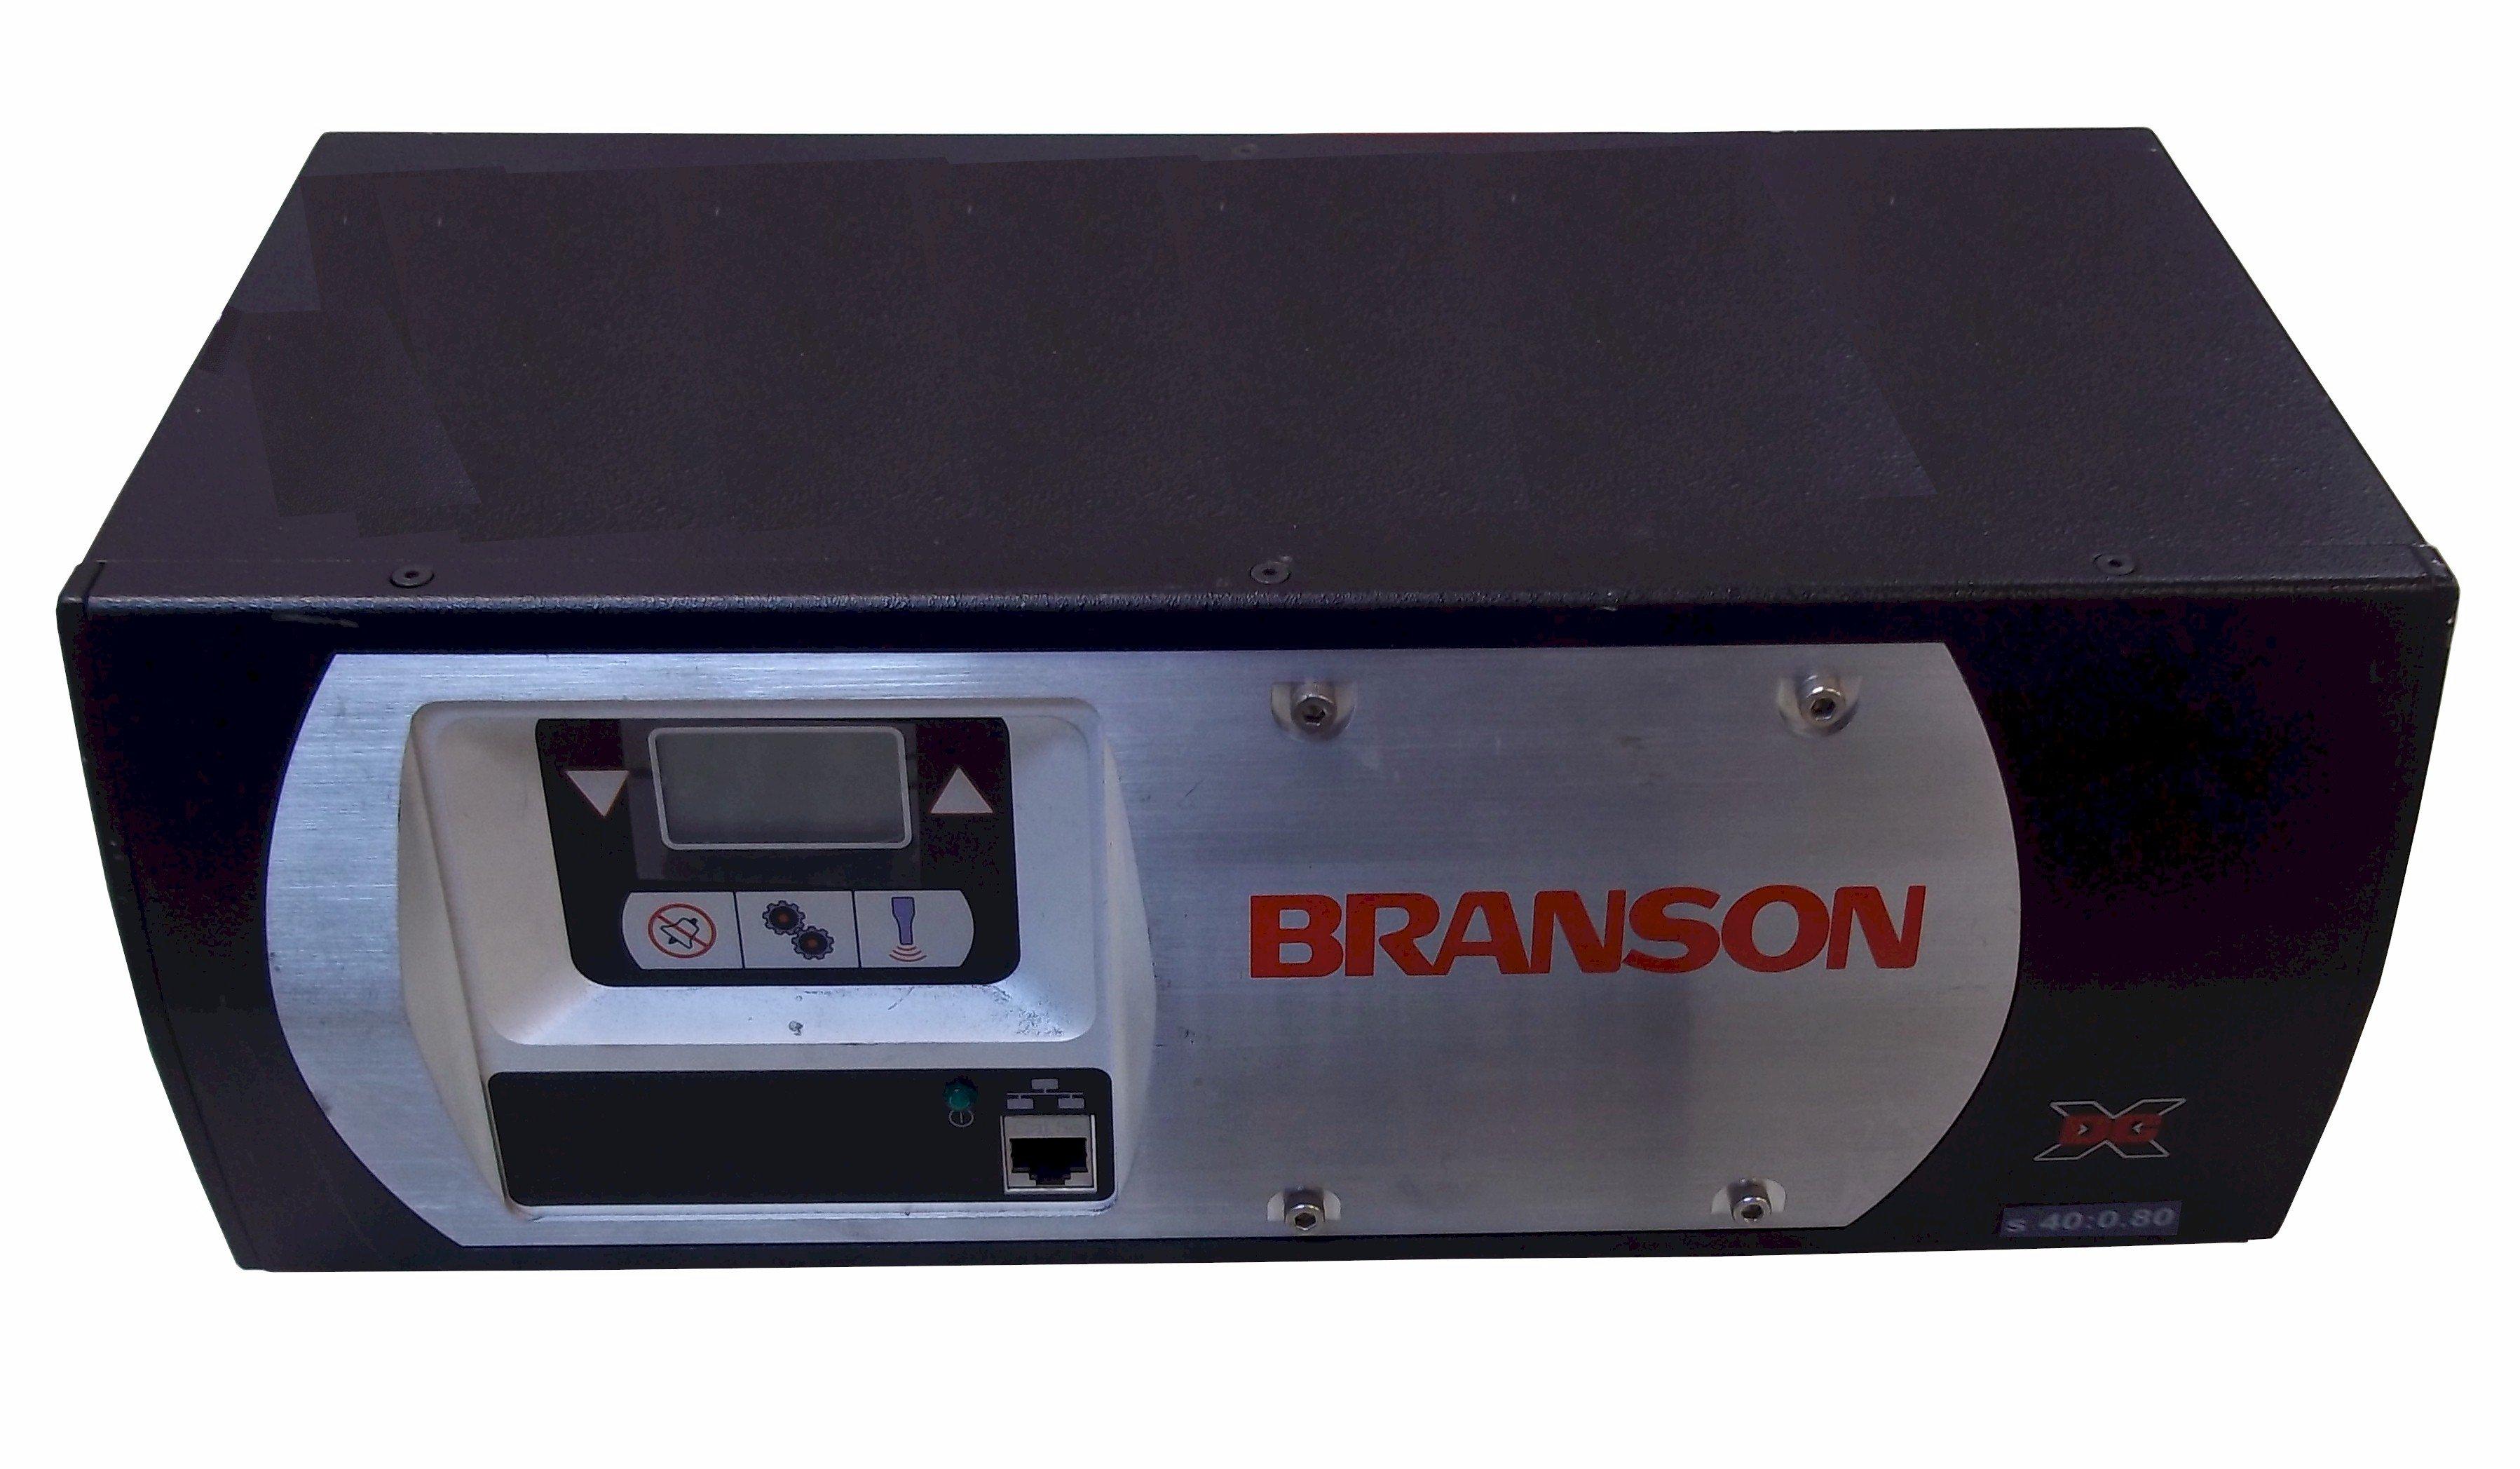 Branson 0.80DCXS40H0R Power Supply Repairs